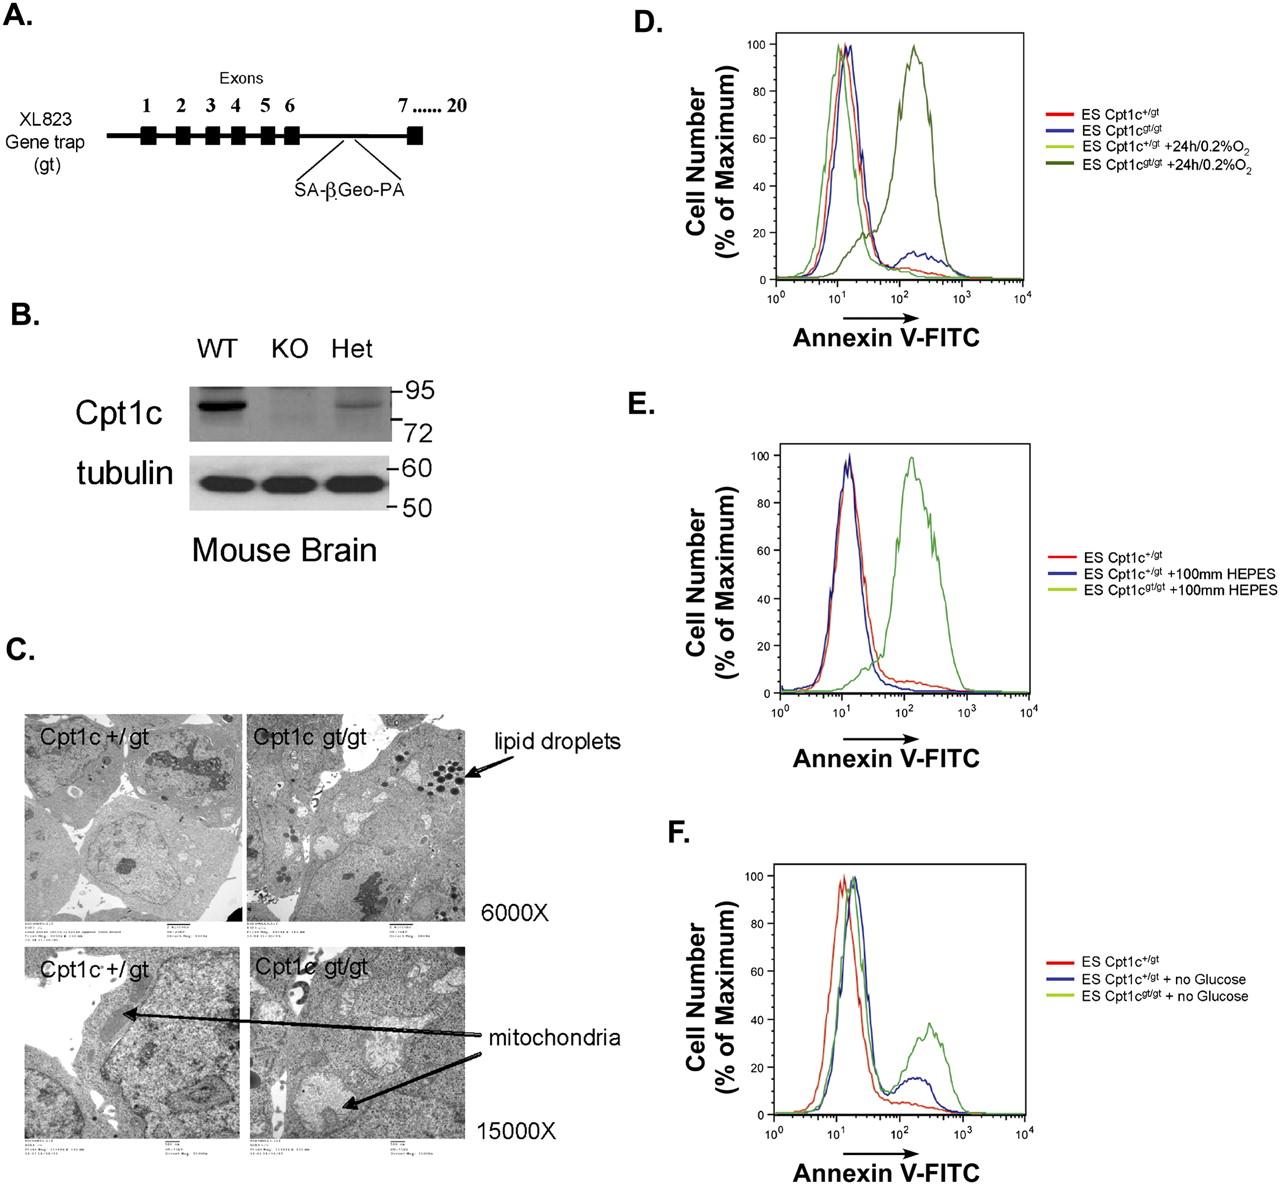 Carnitine Palmitoyltransferase 1c Promotes Cell Survival